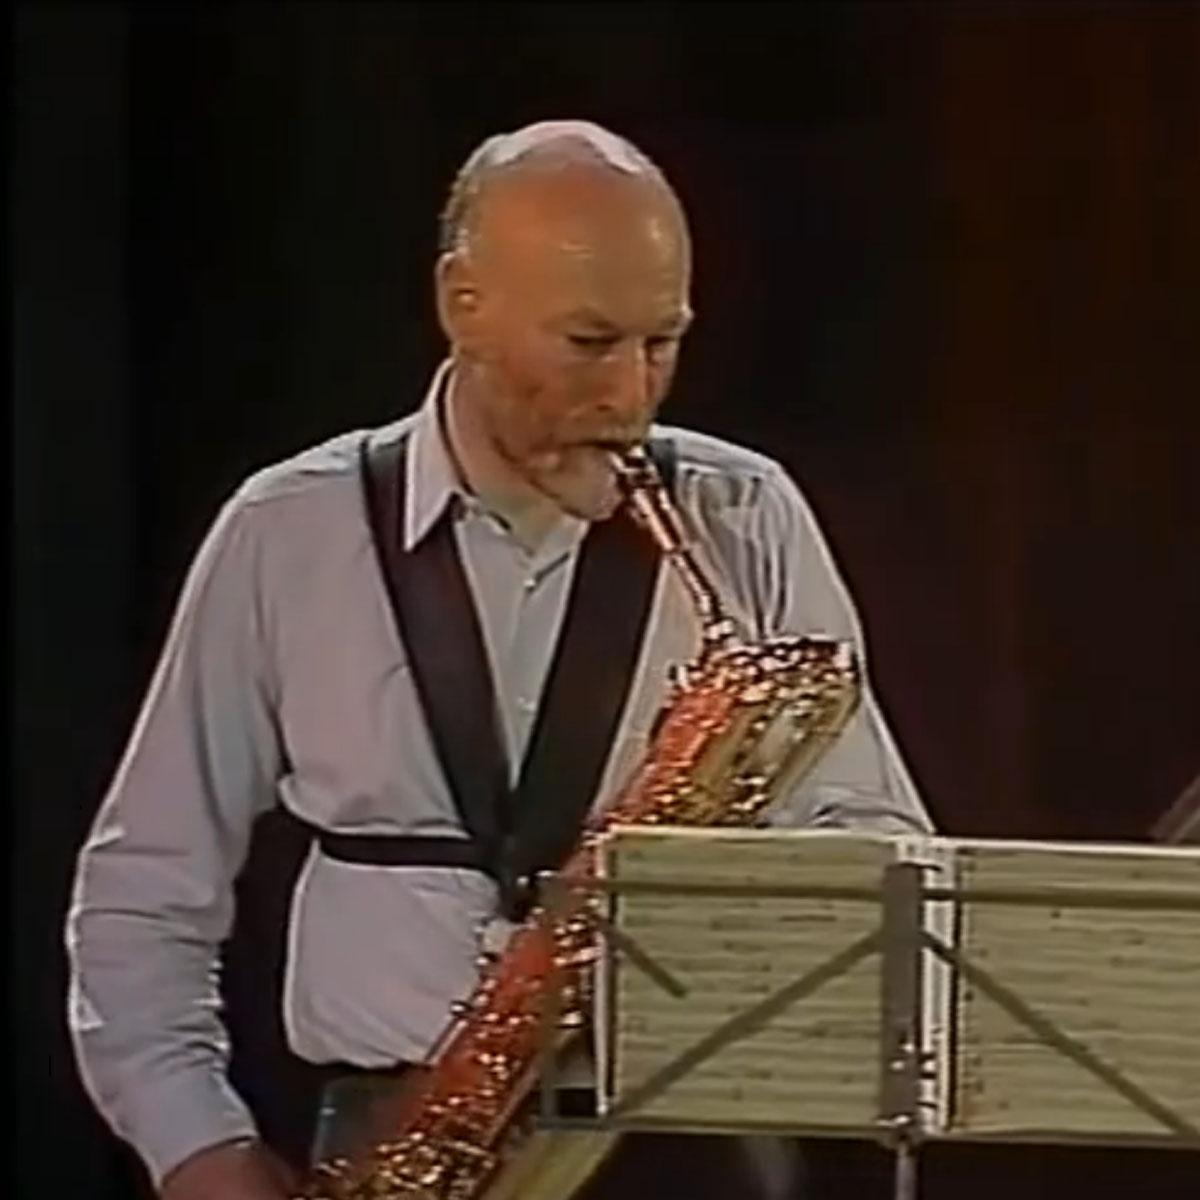 Keith1985